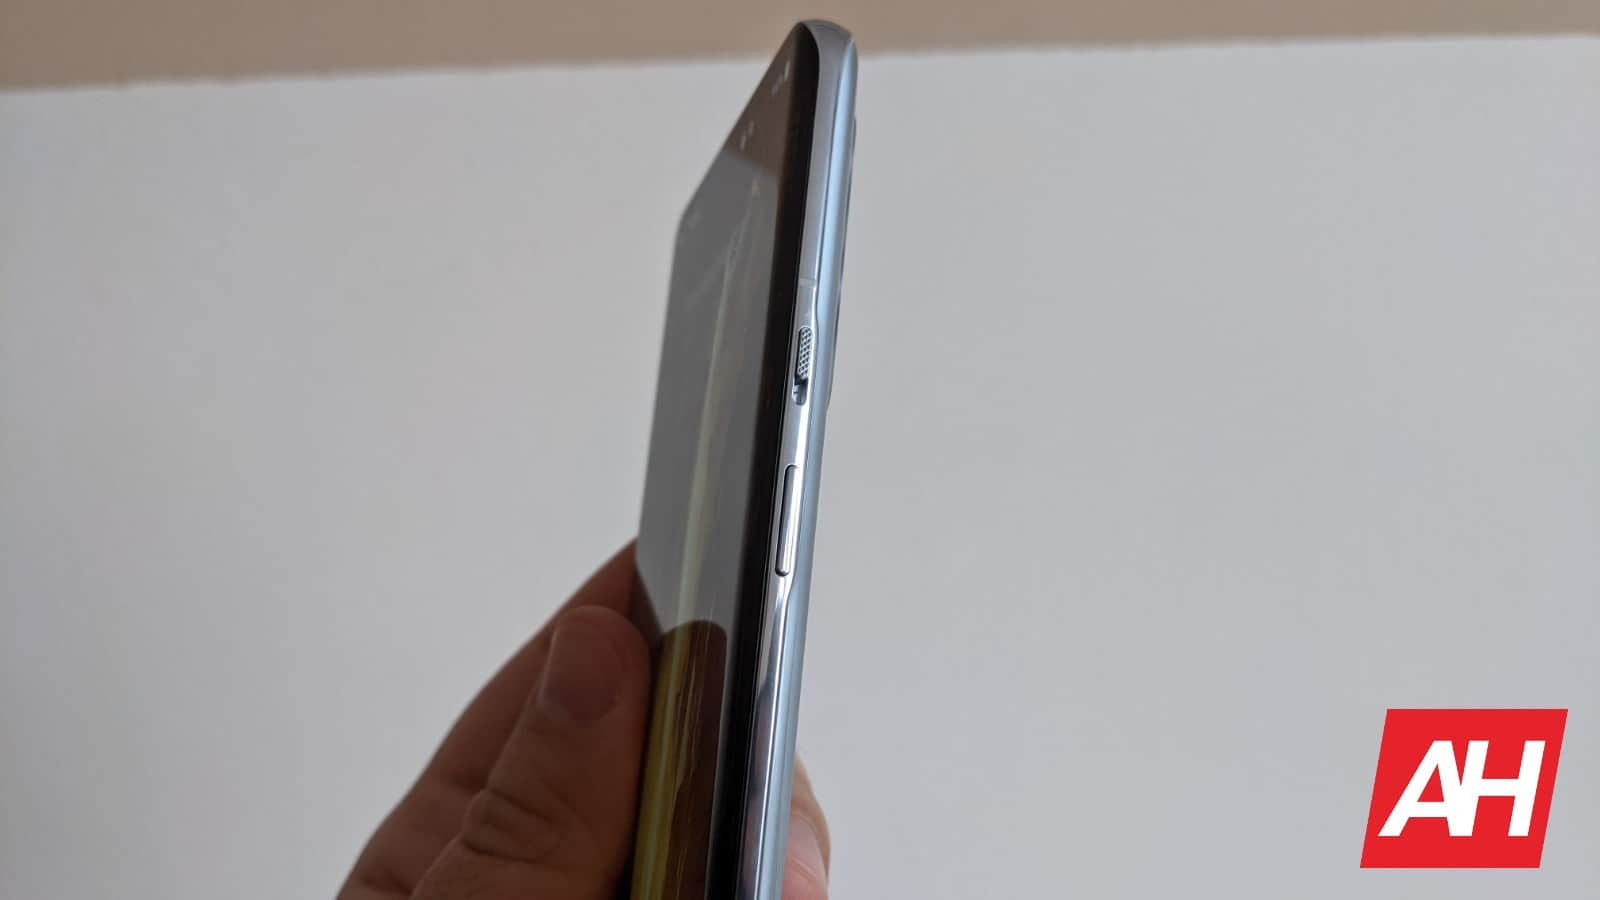 AH OnePlus 9 Pro KL image 62